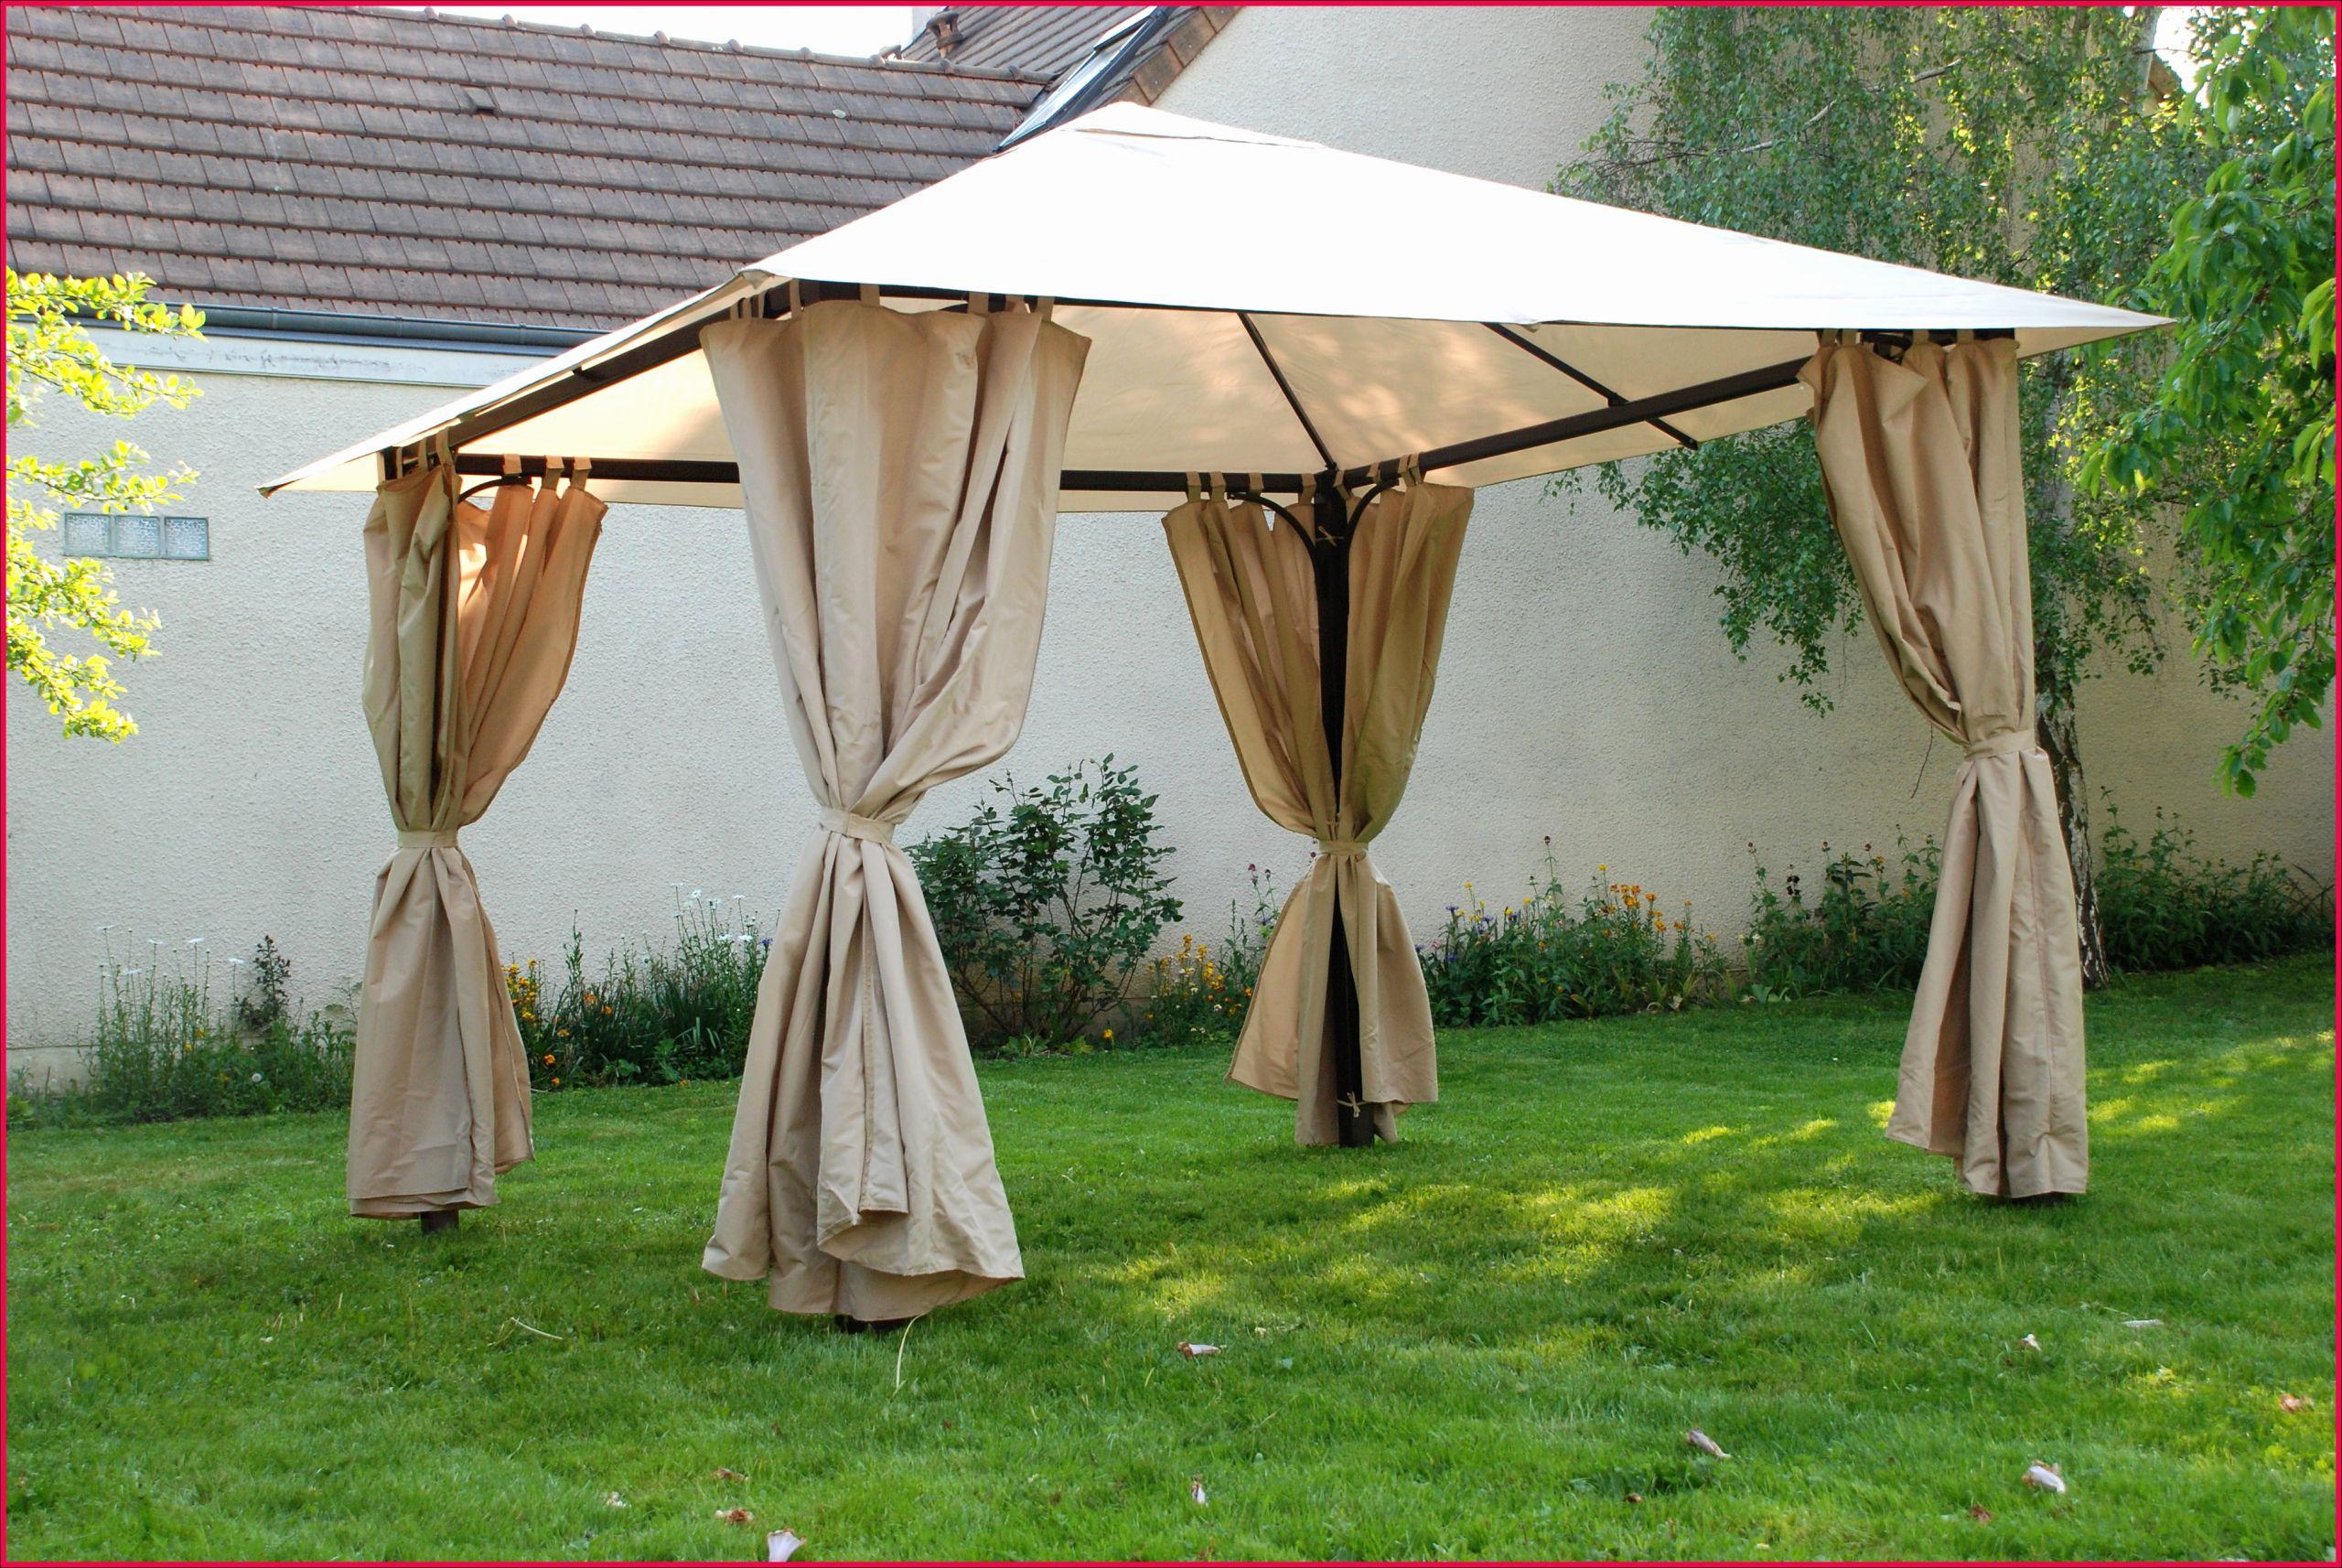 Foire Fouille Salon De Jardin Charmant Emejing tonnelle De Jardin Foire Fouille House Of 40 Beau Foire Fouille Salon De Jardin